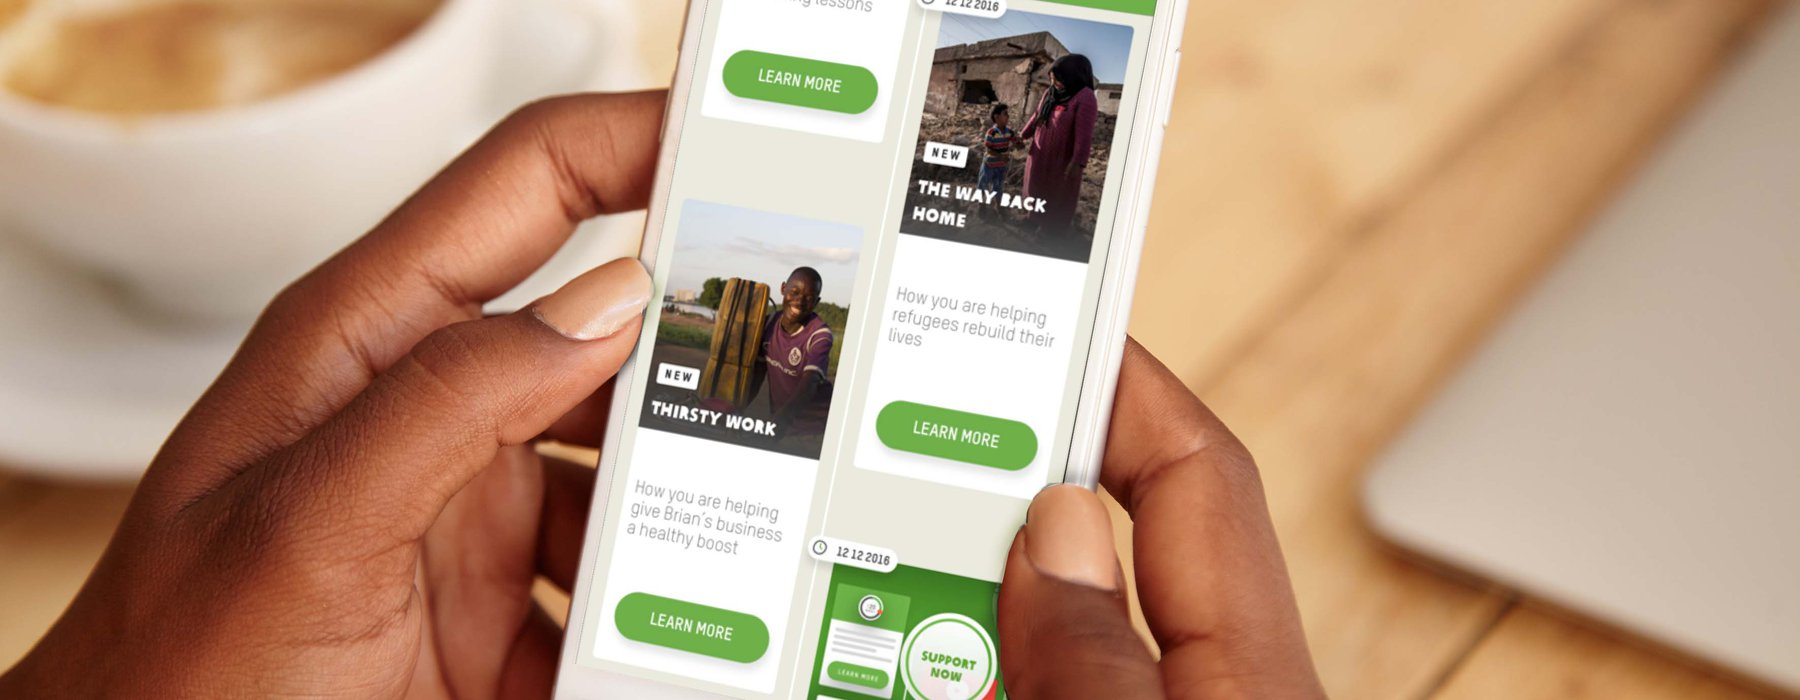 MyOxfam app photo